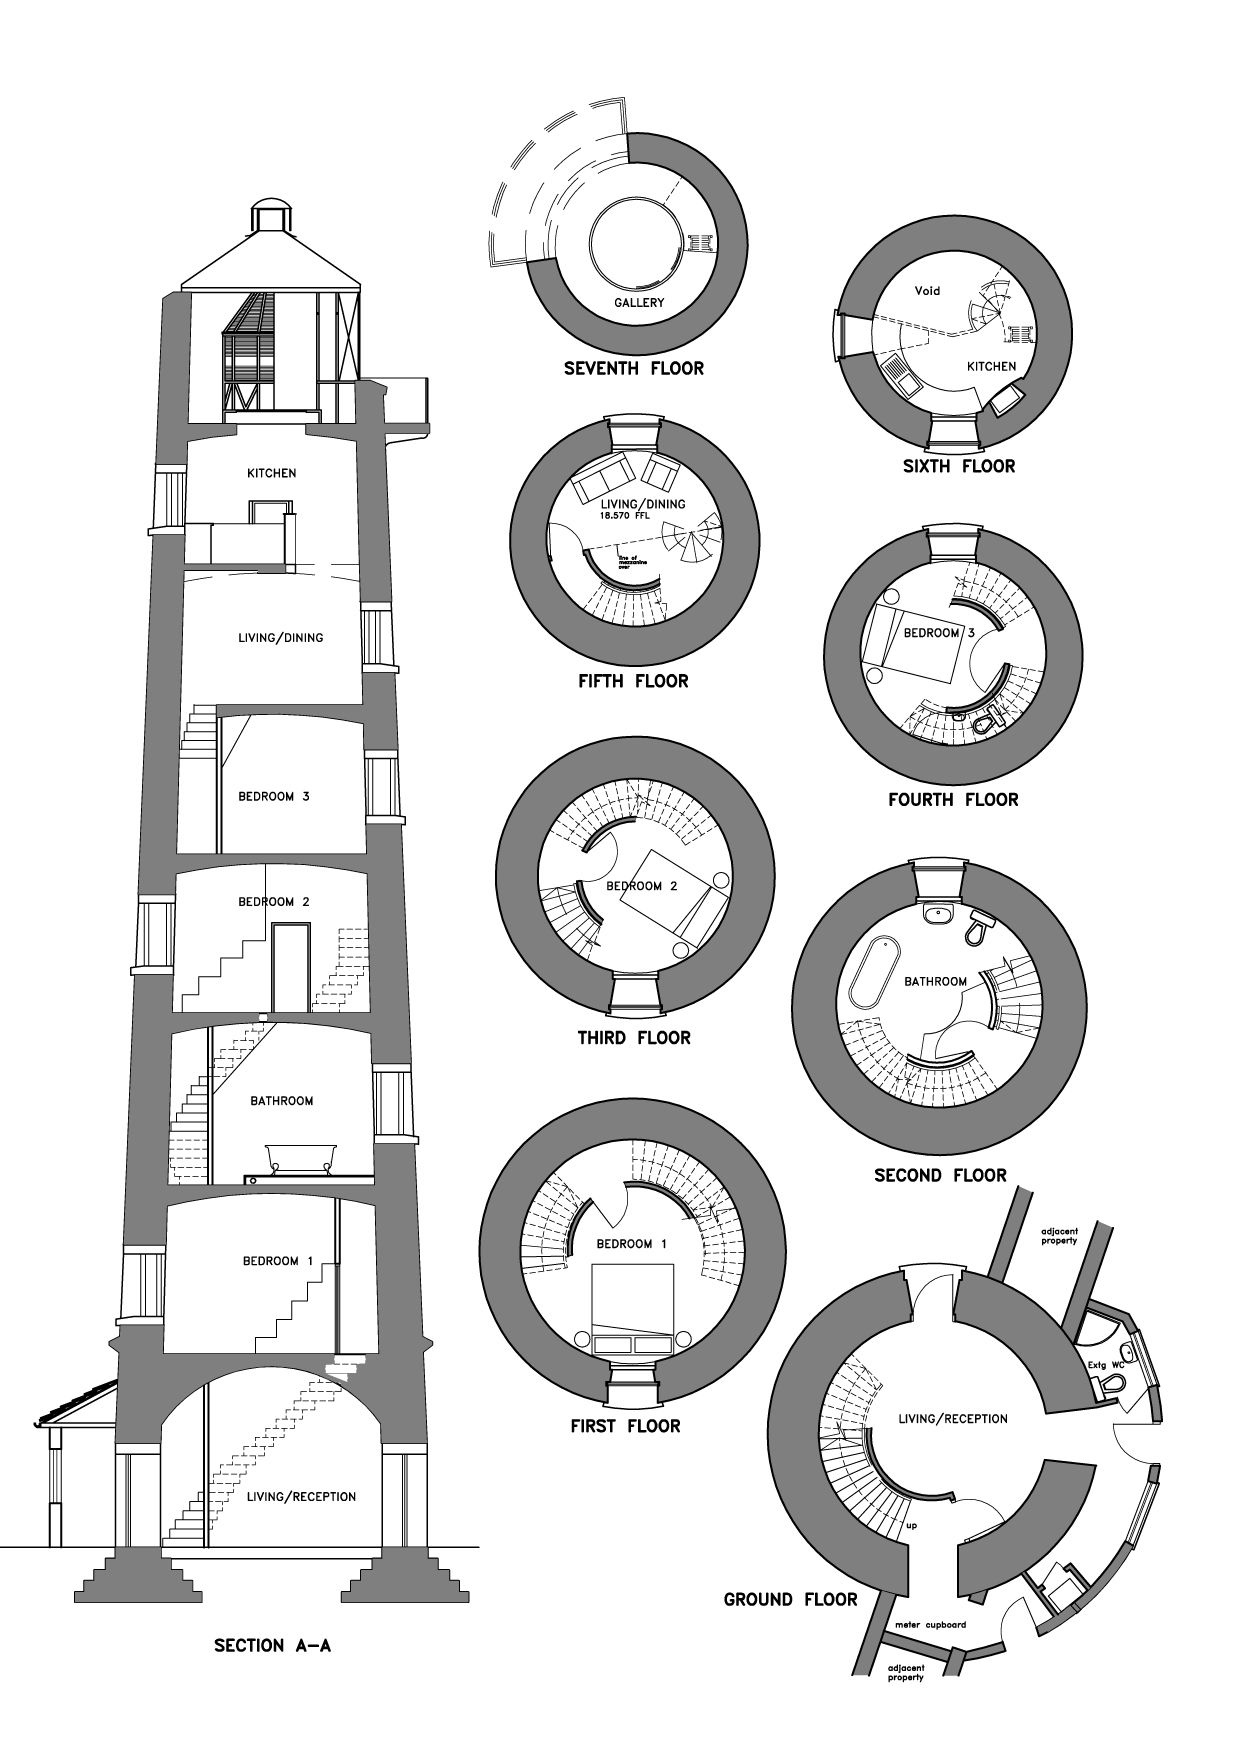 fa6ab9158ce4944f281b1bc89b2fc82c Lighthouse Beach House Floor Plans on smalll redwood, okaloosa island, upside down, narrow lot, one story, two bedroom,